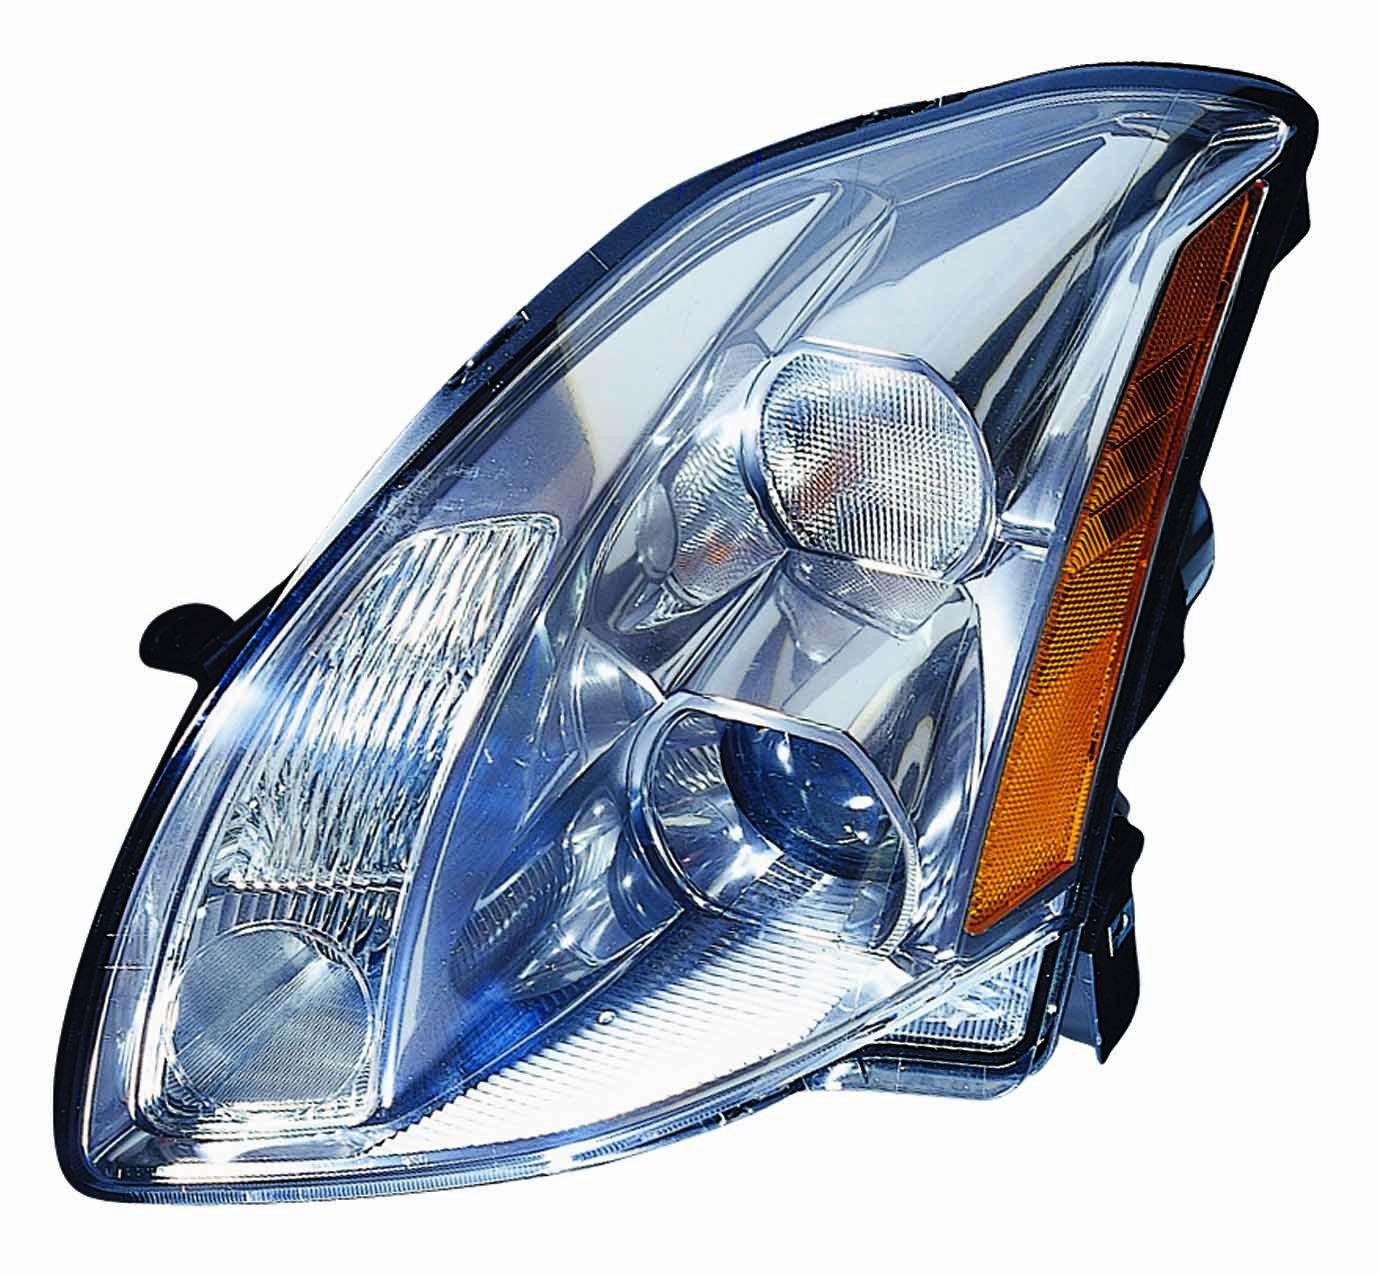 Depo 315-1149R-ASHN7 Nissan Maxima Right Hand Side Xenon Head Lamp Assembly 02-00-315-1149R-ASHN7